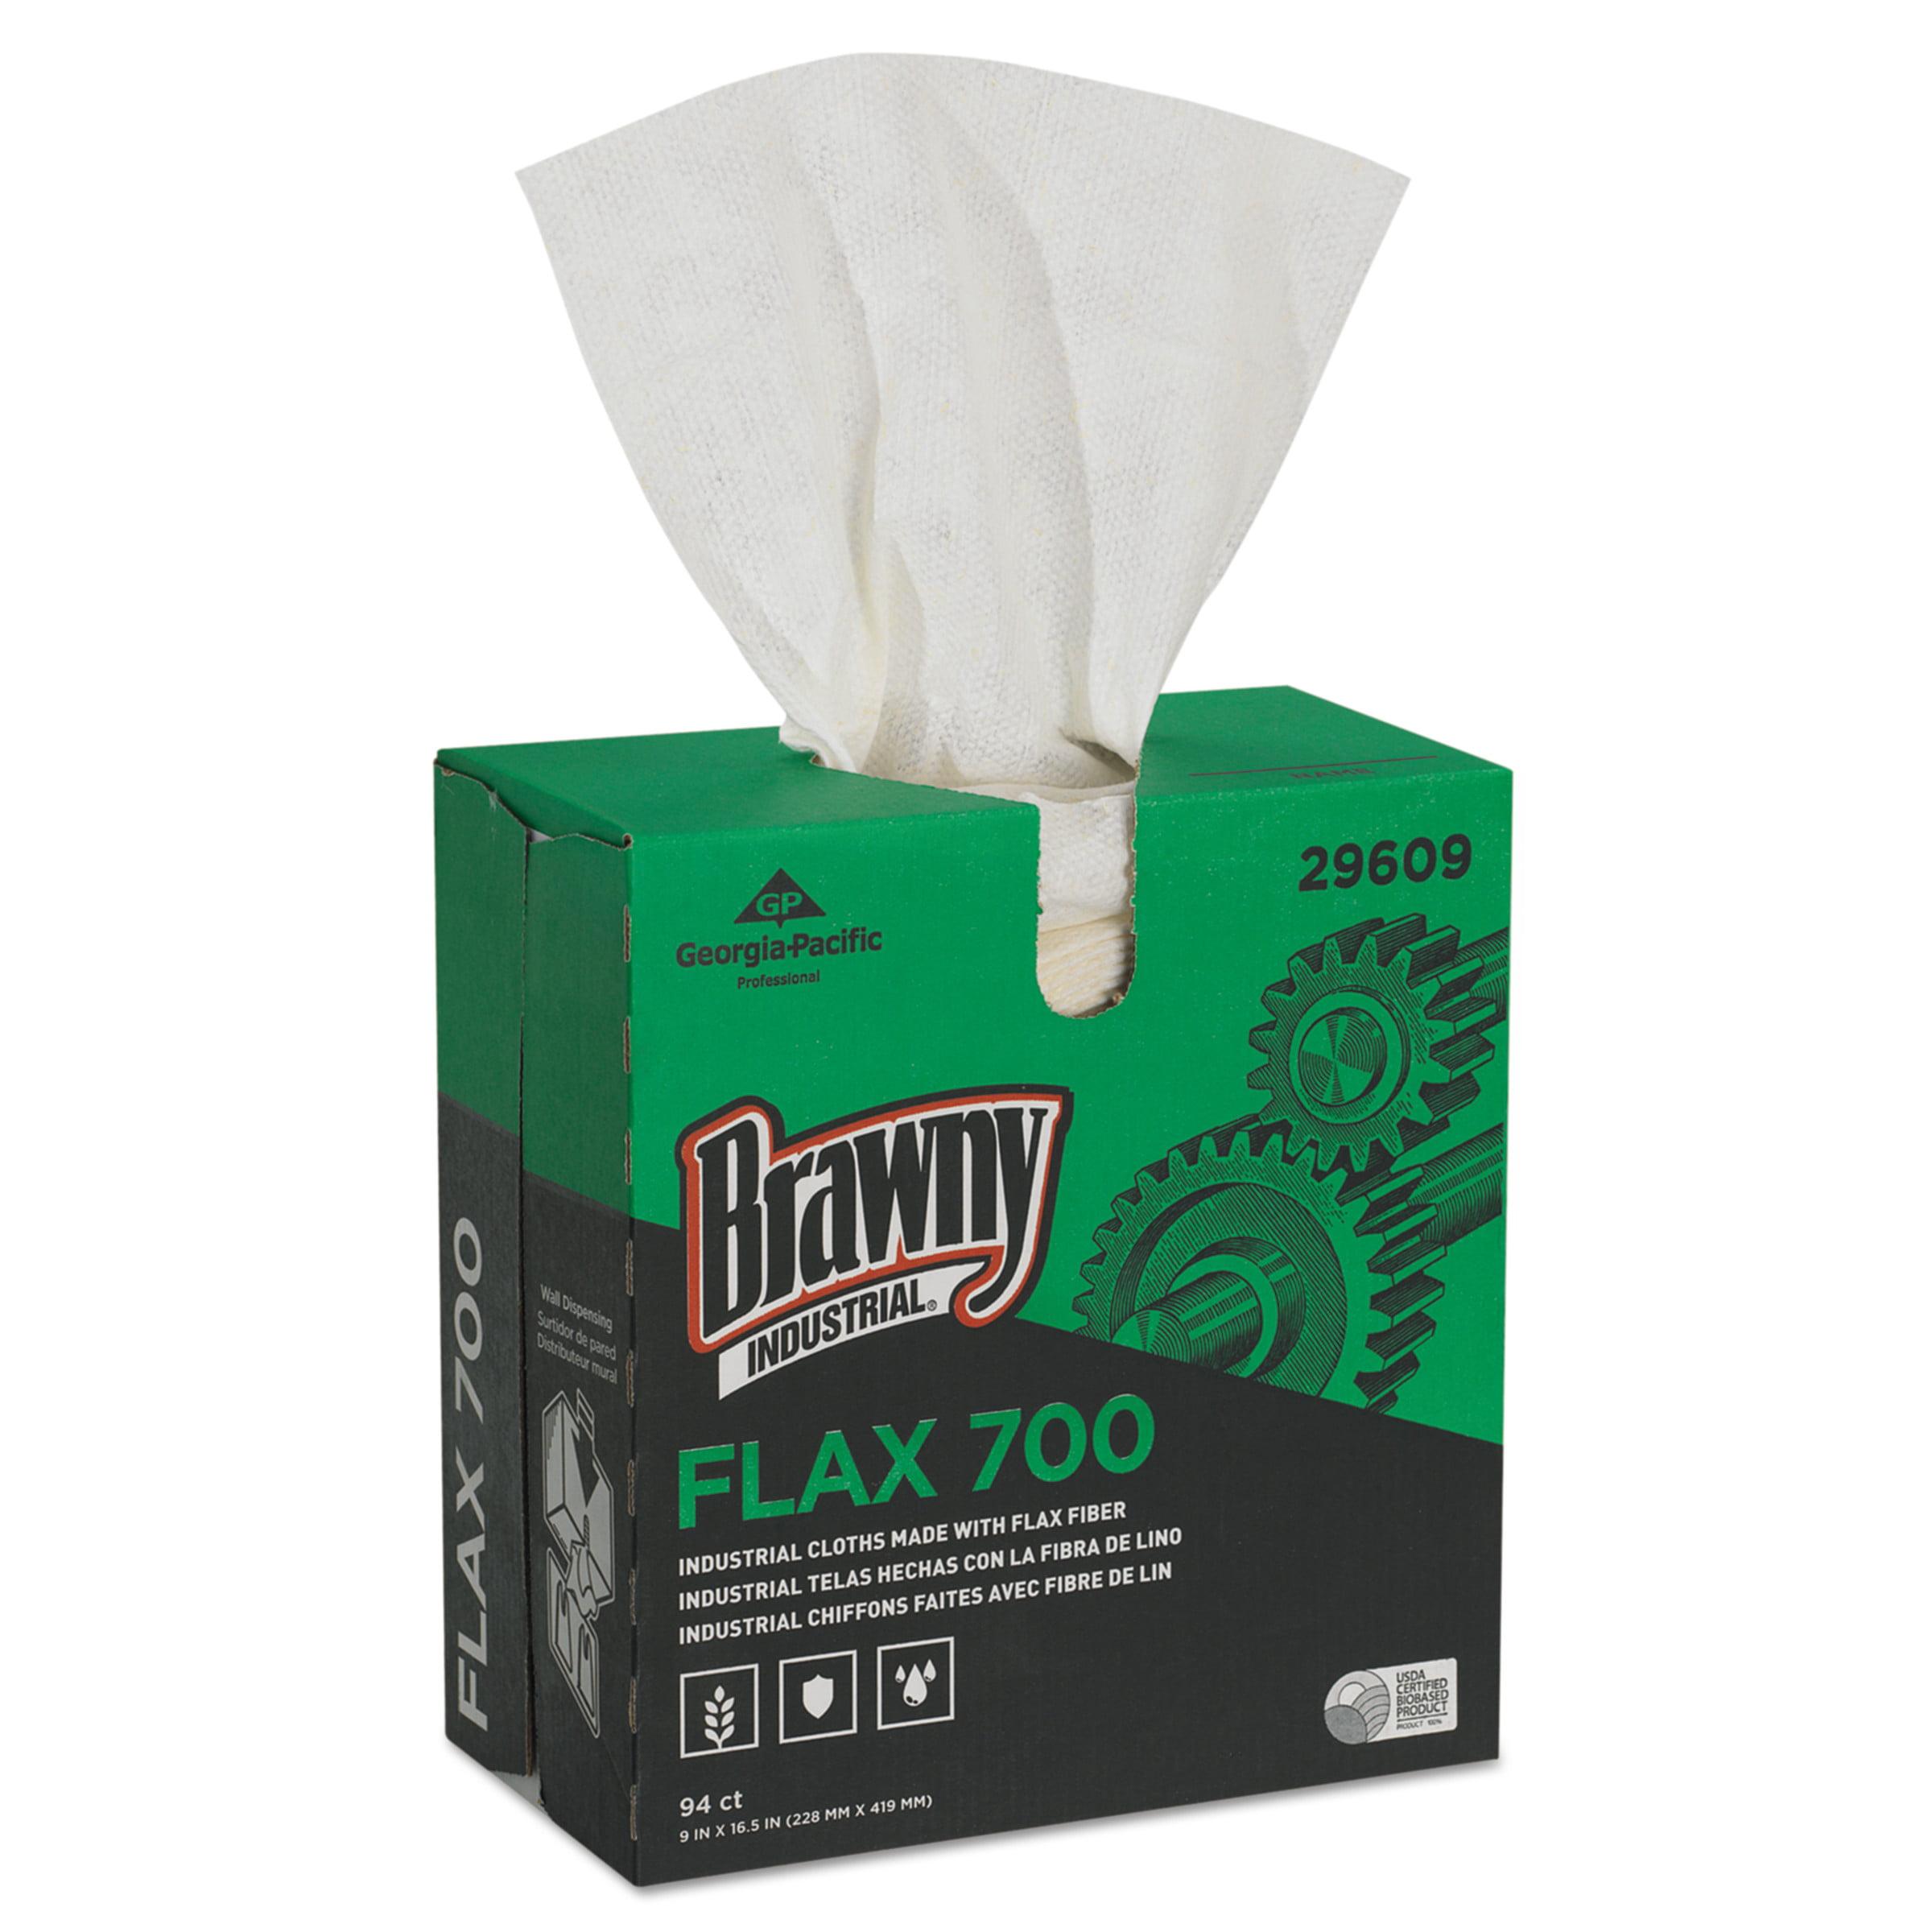 Brawny Industrial FLAX 700 Medium Duty Cloths, 9 x 16 1/2, White, 94/Box, 10 Box/Carton -GPC29609